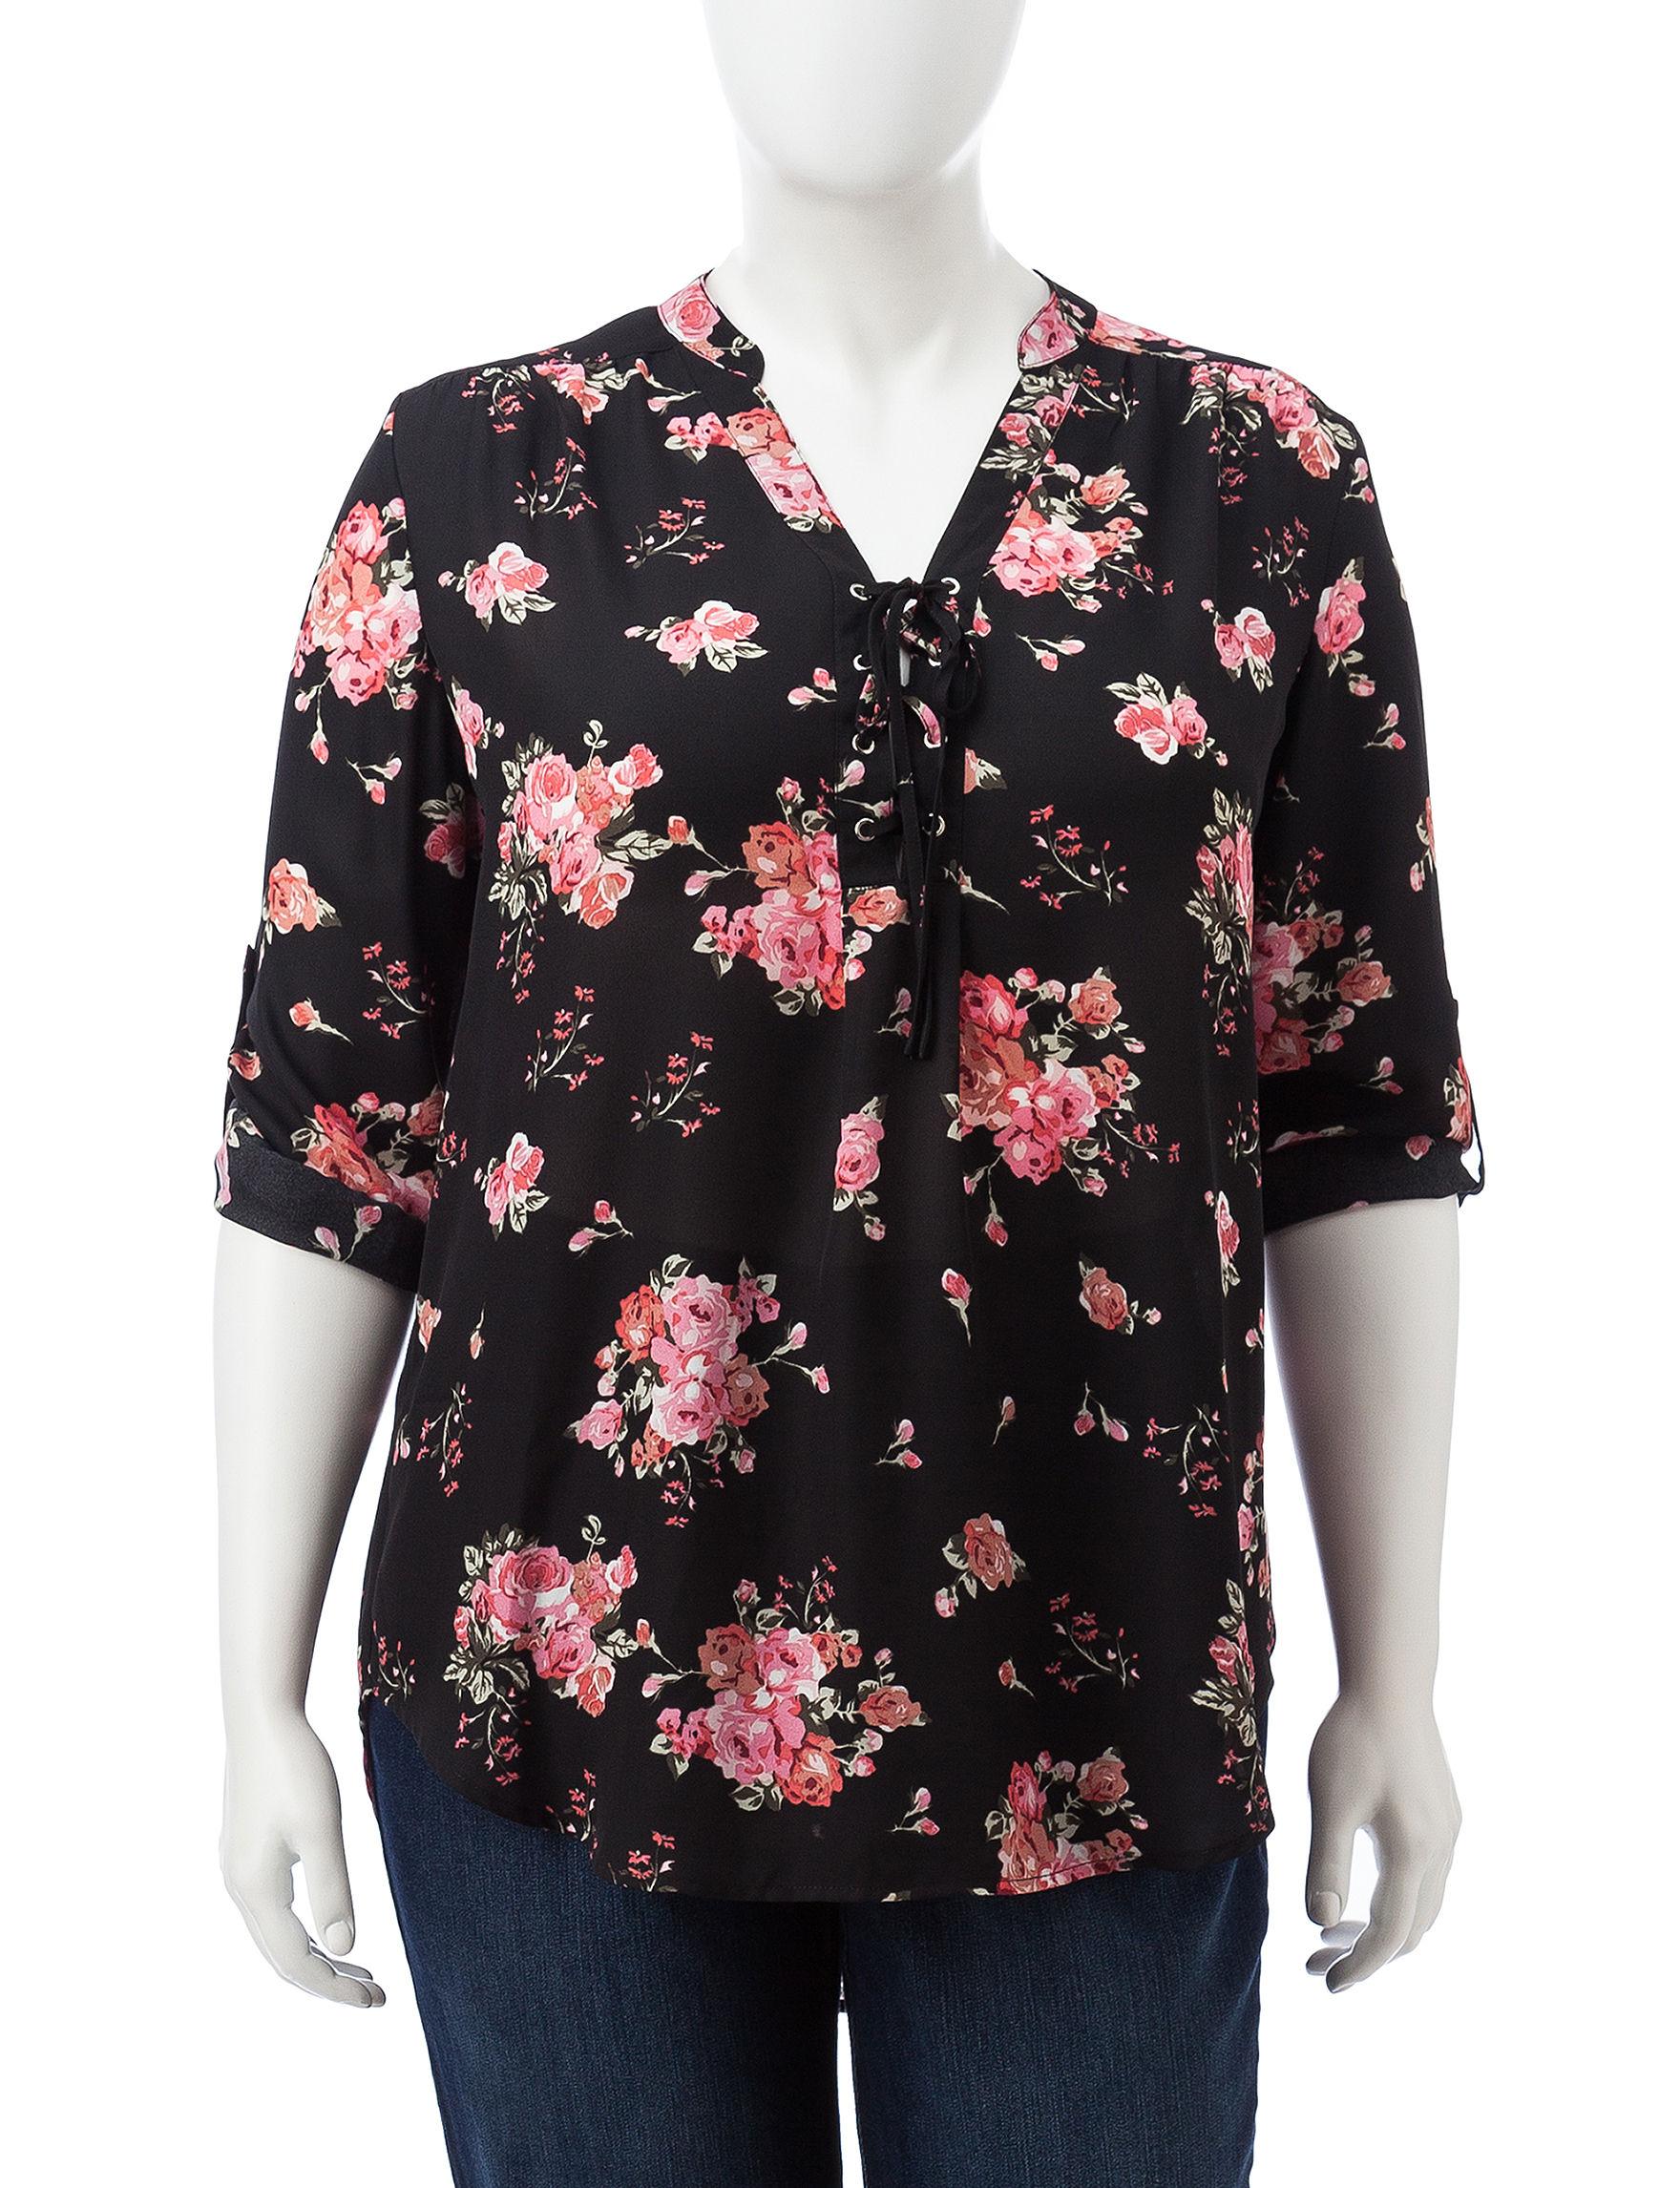 Justify Black Floral Shirts & Blouses